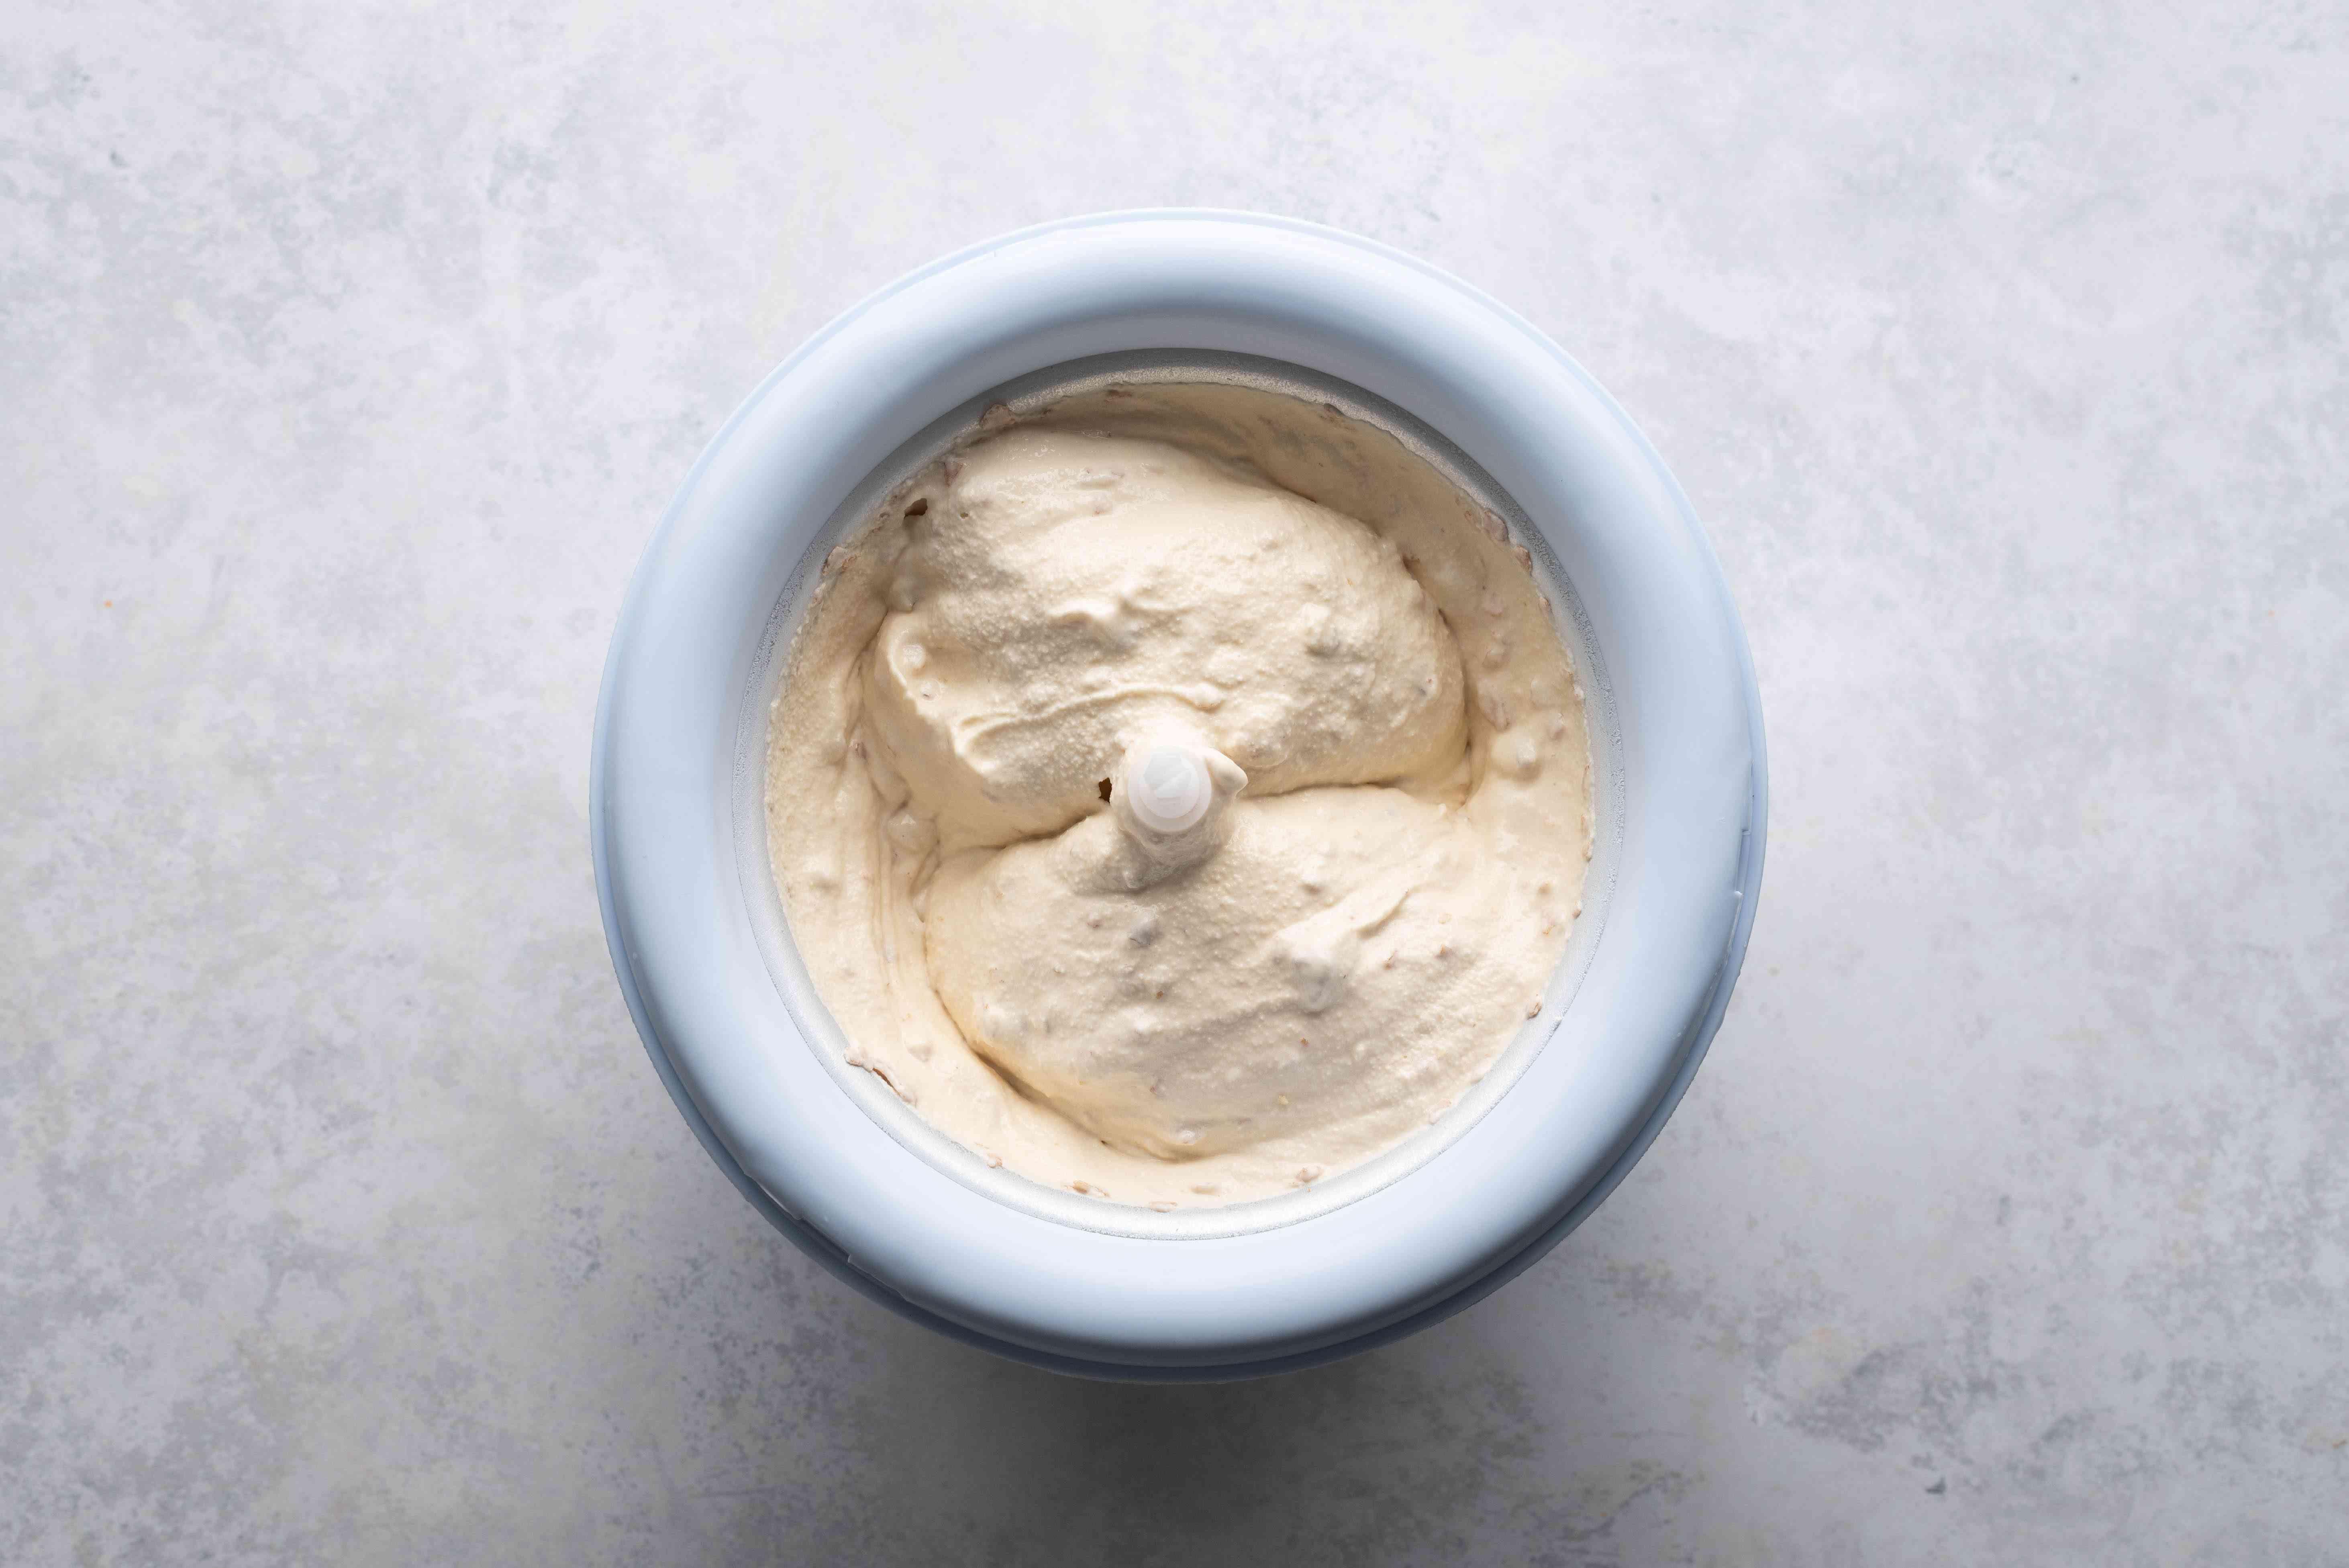 custard in an ice cream machine